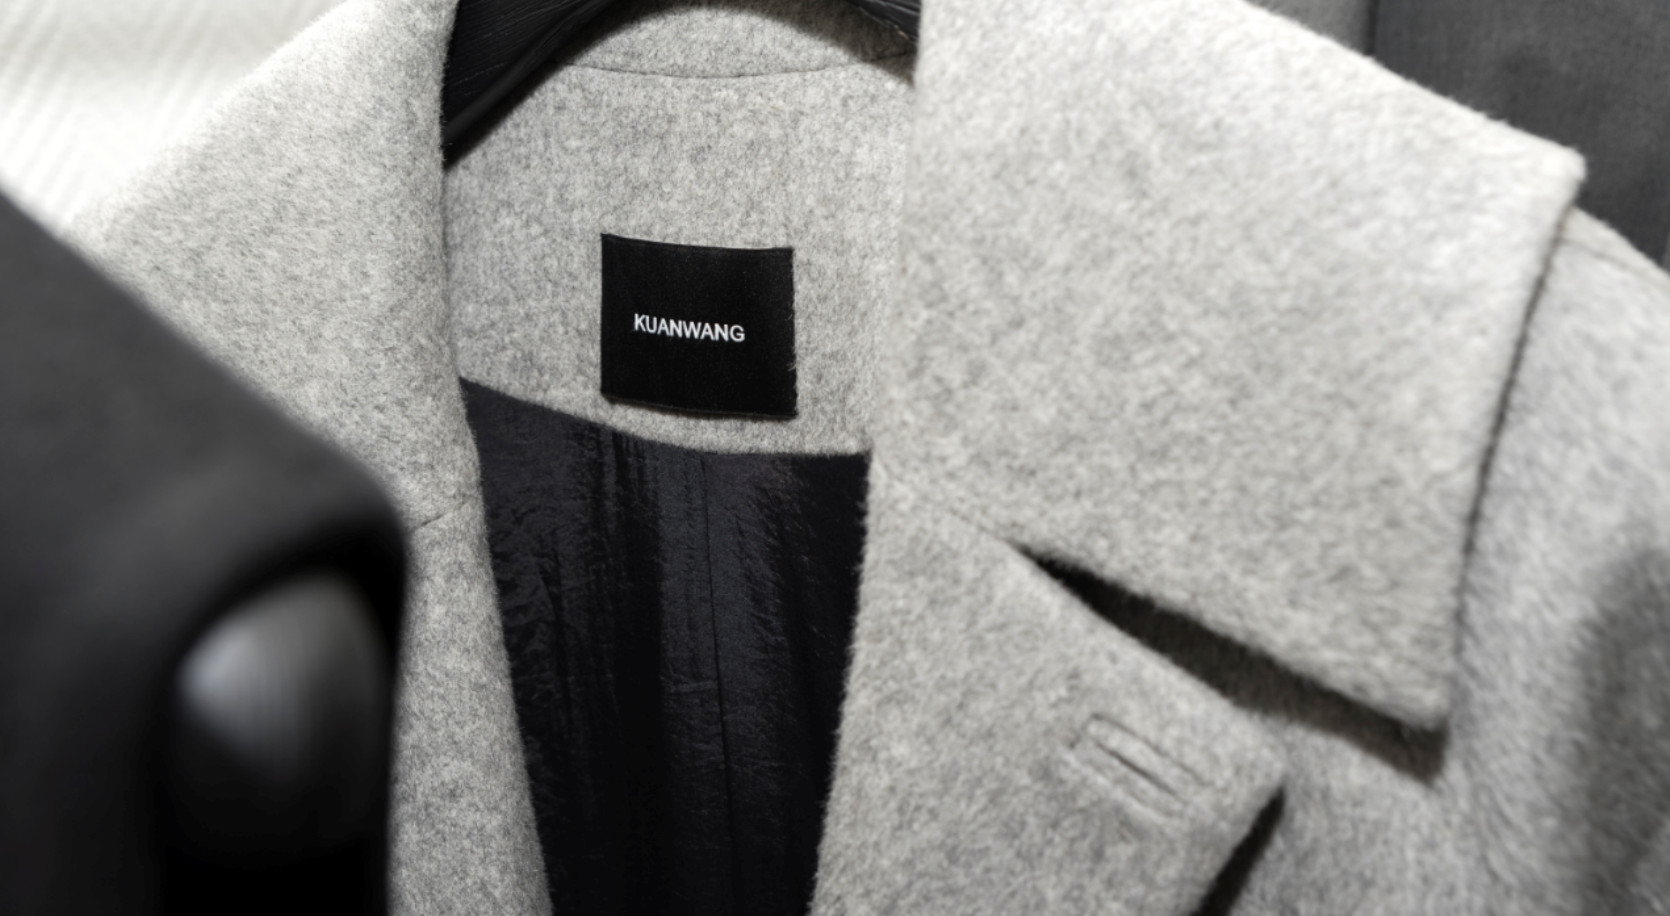 Kuanwang during paris menswear fashion week 2021 fw2122 collection (1)